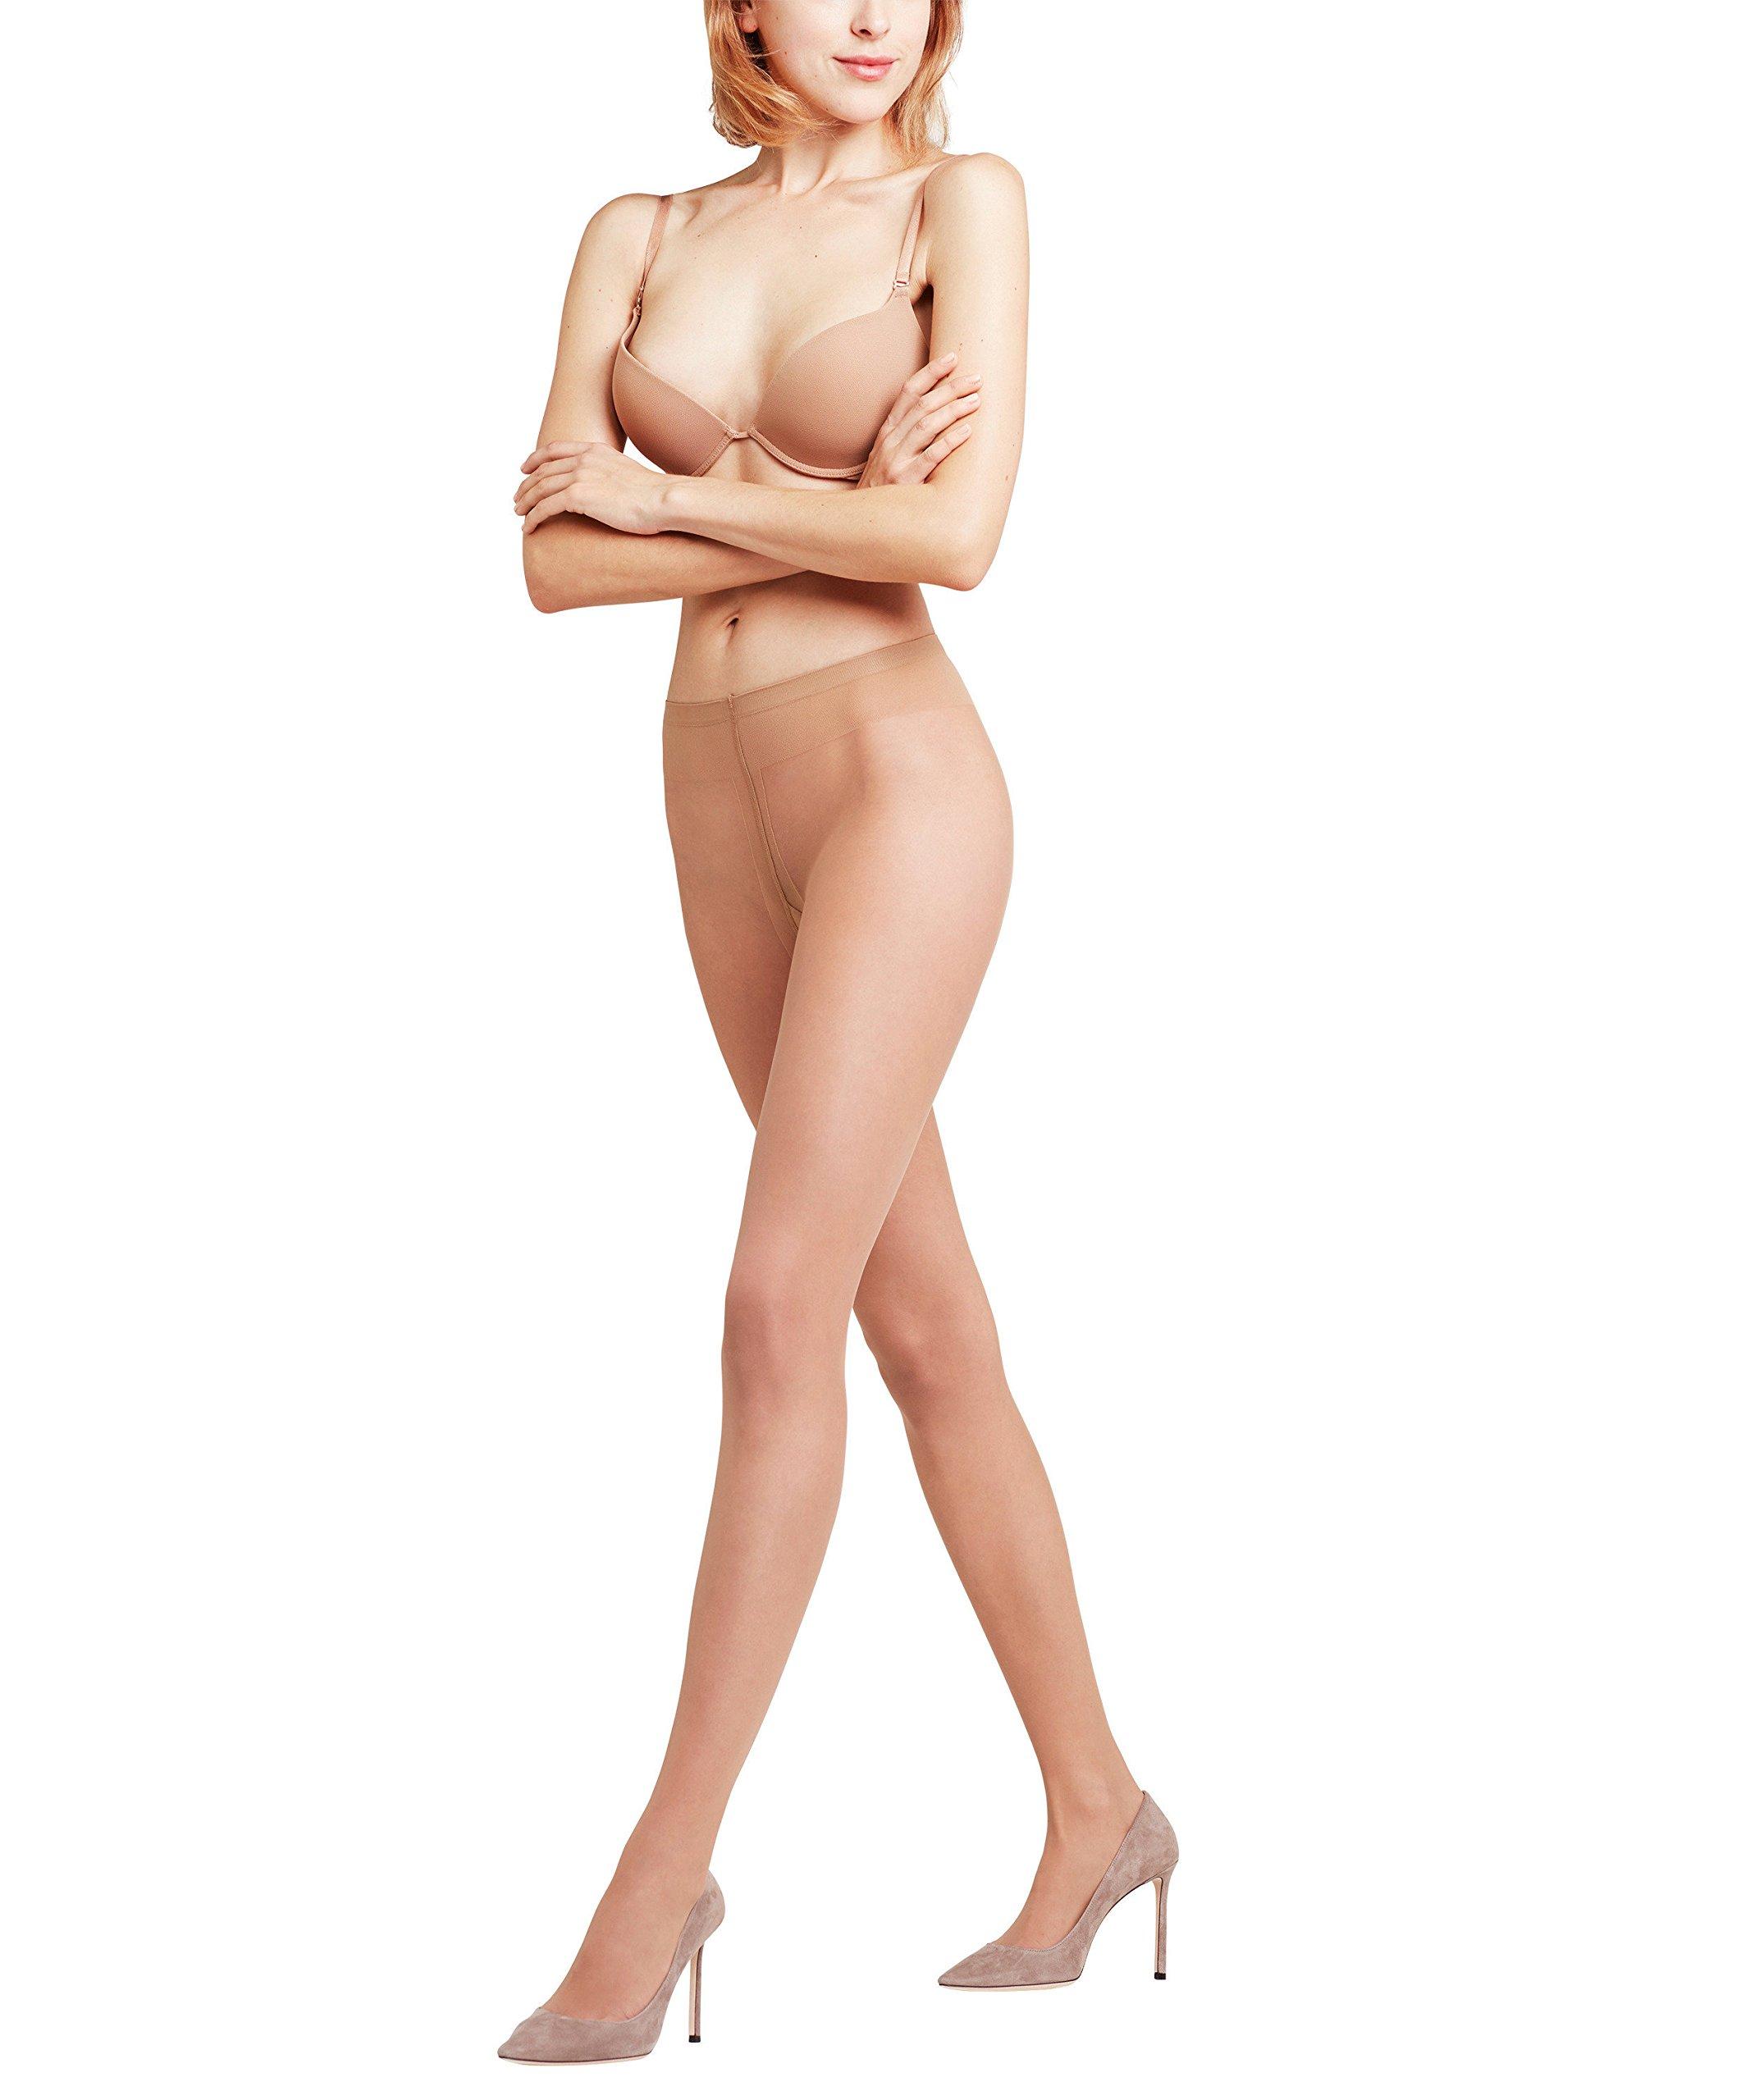 FALKE Women Fond de poudre 10 DEN Tights - Ultra-Sheer, Sizes S to XL, 1 Pair - Elegant, ideal for open shoes